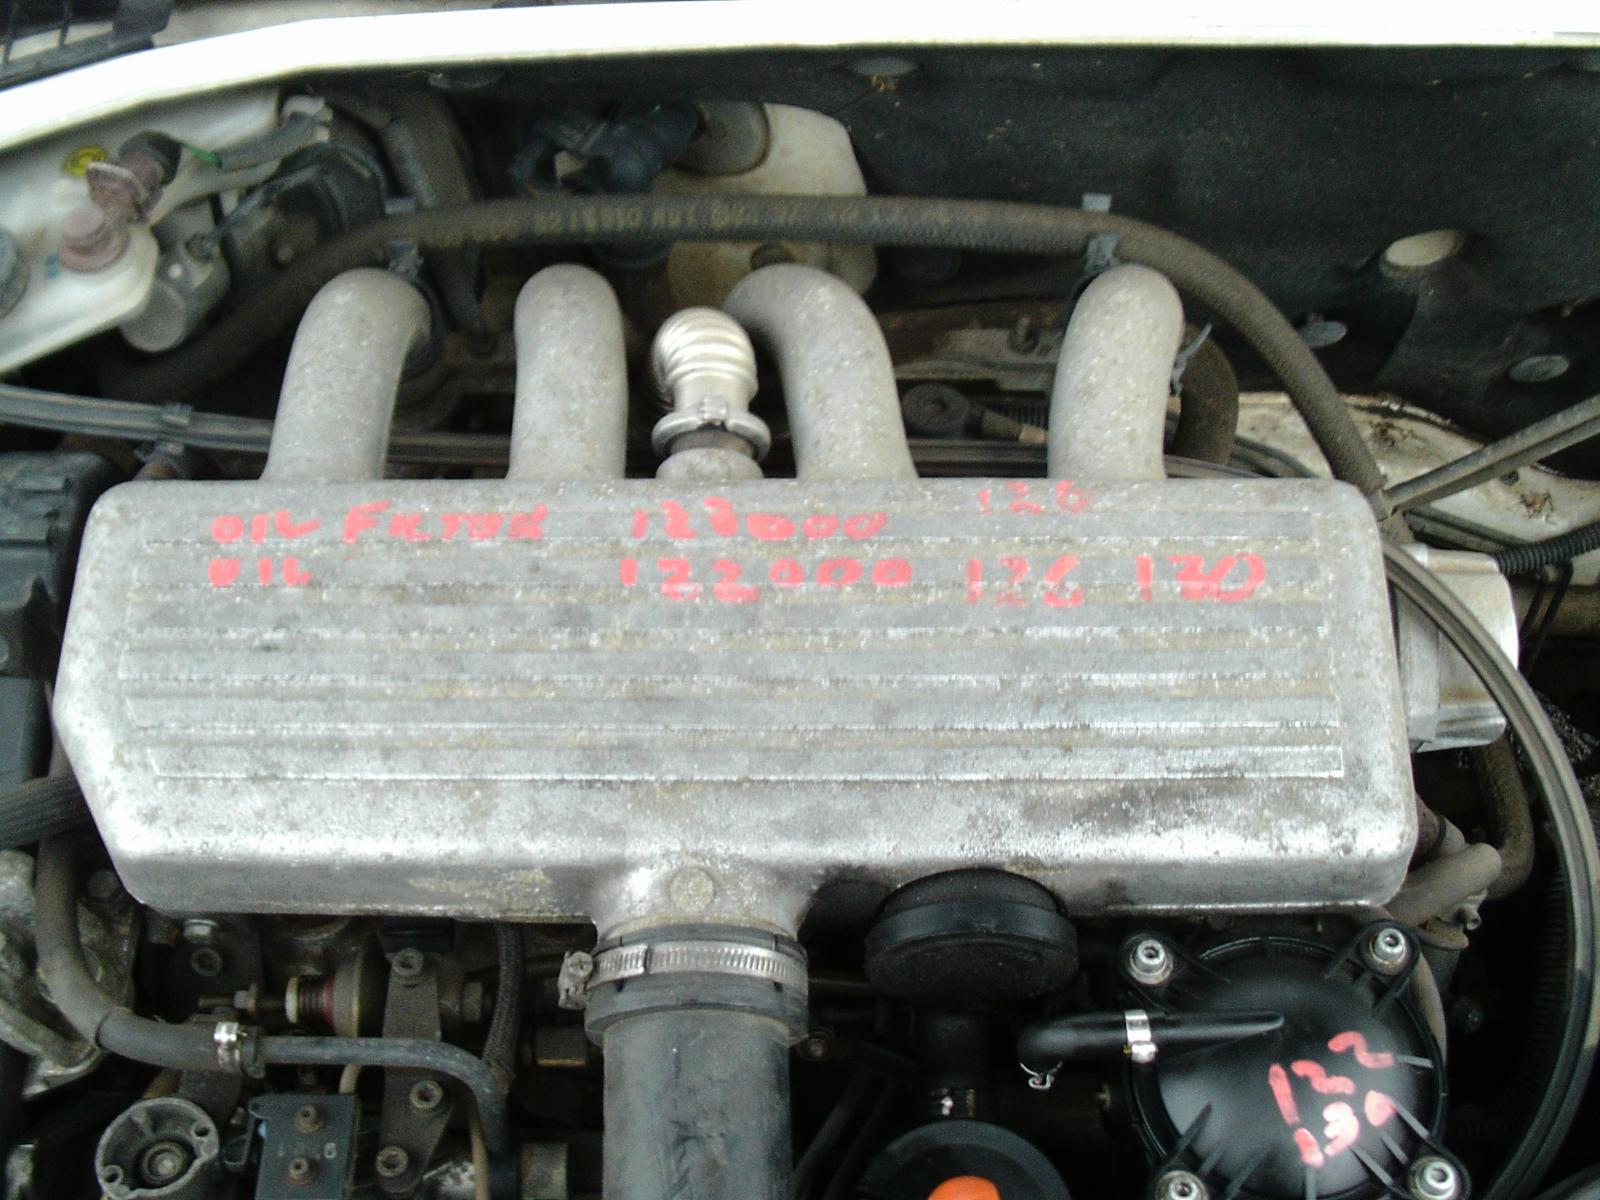 PTDC0049.JPG